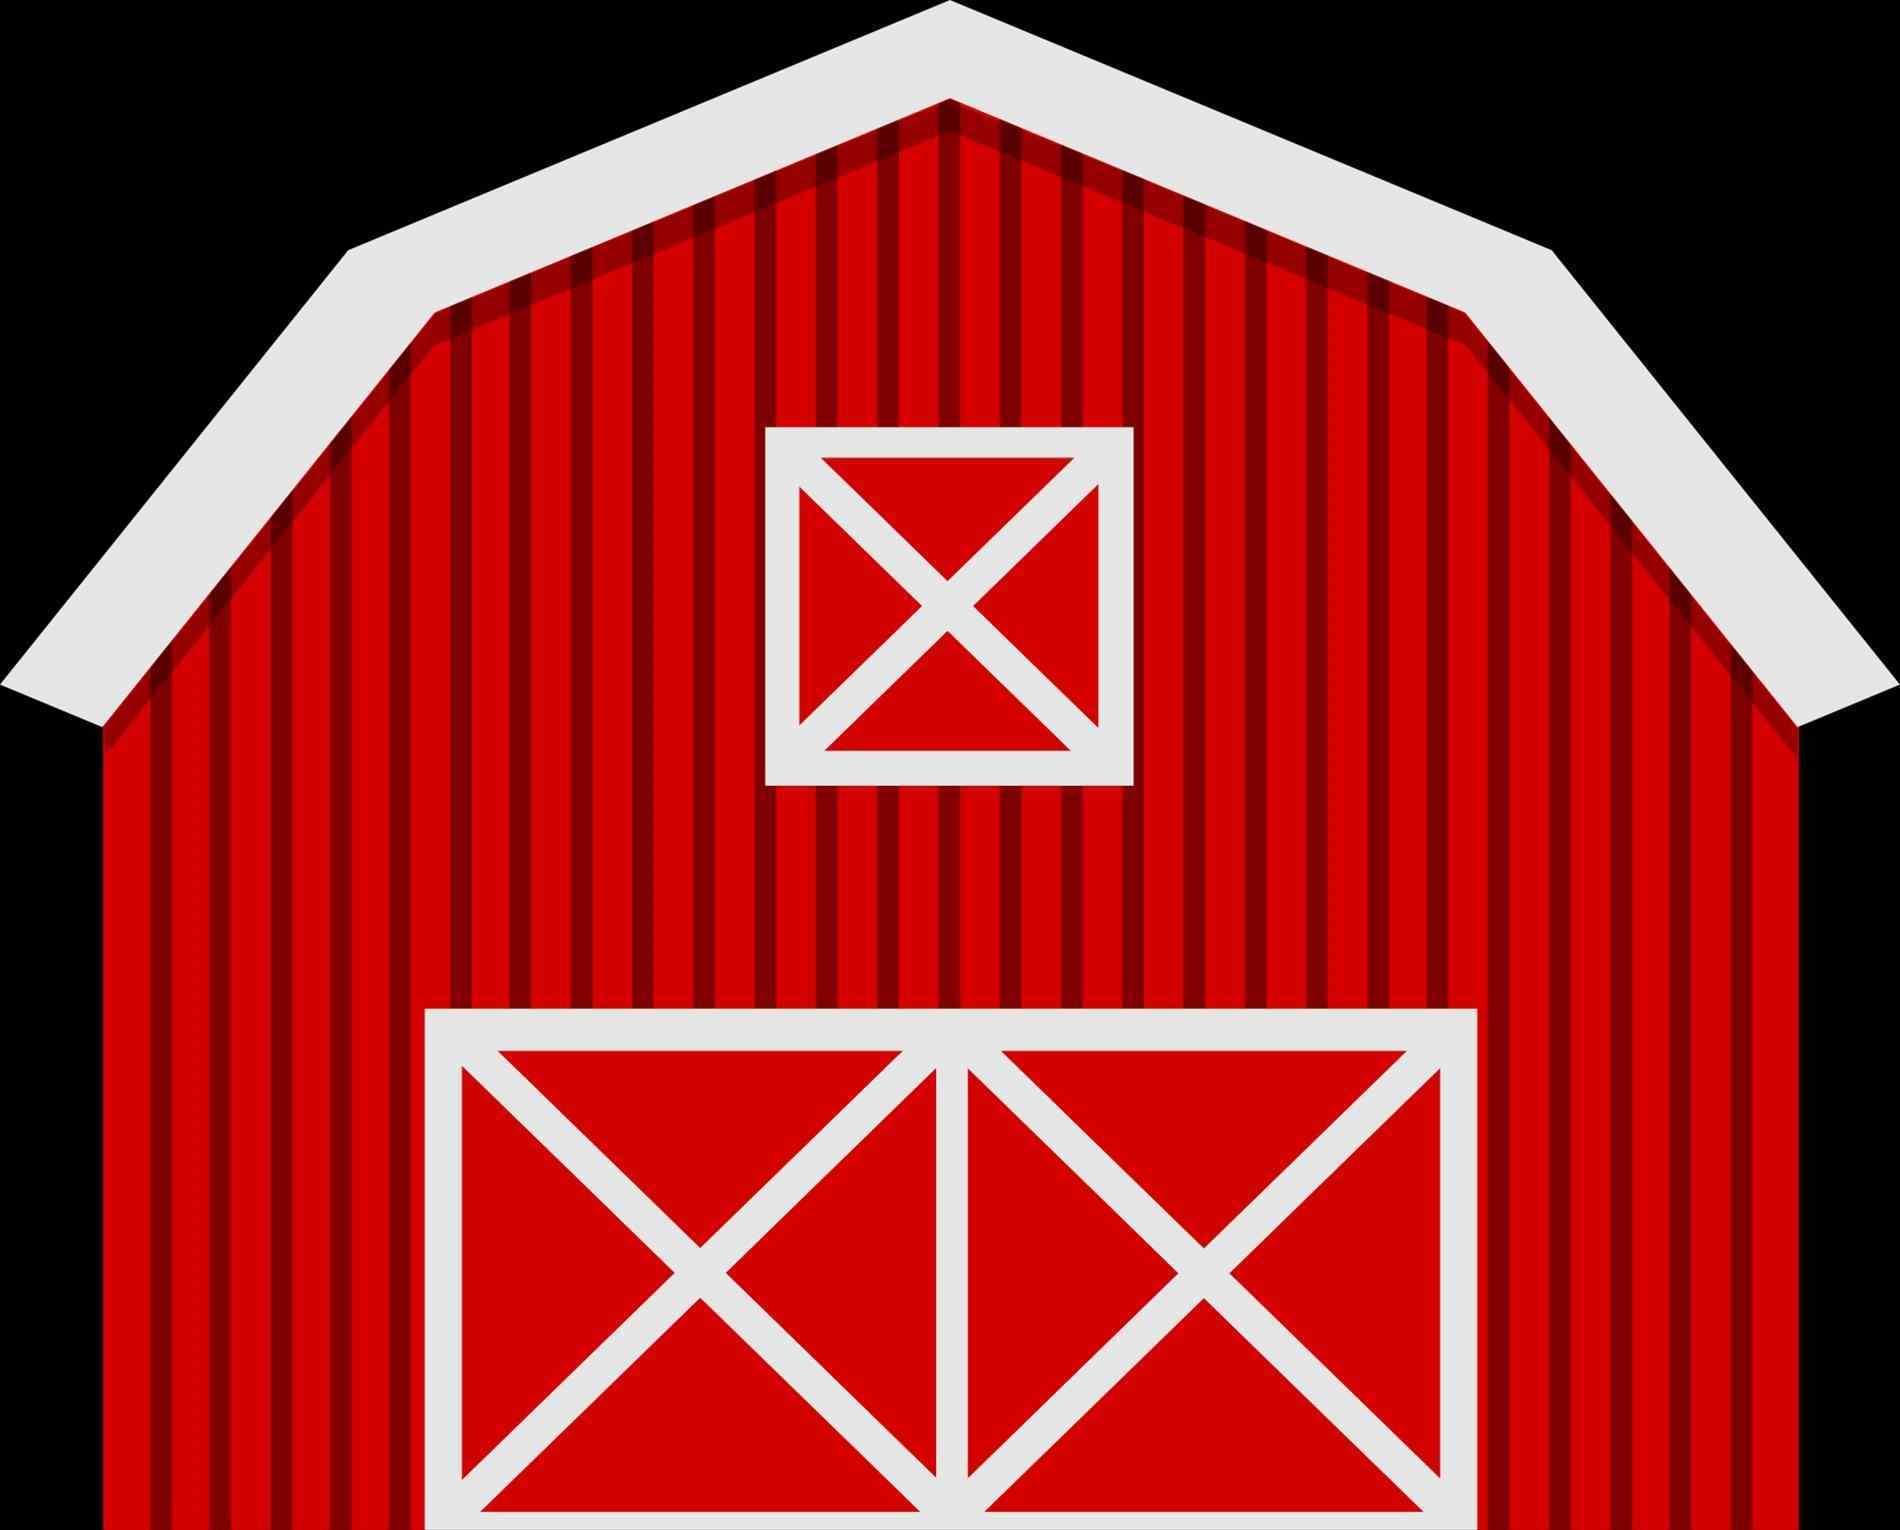 1900x1530 Art Furniture Decorating Ideas Top Free Spot Top Red Barn Clipart